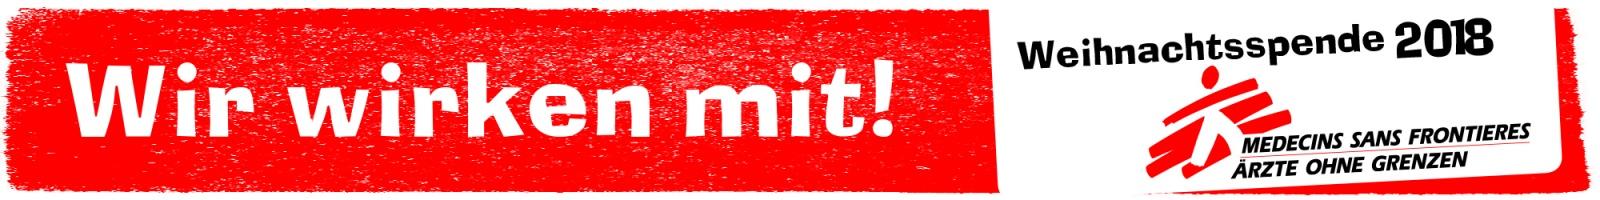 https://www.amomed.com/wp-content/uploads/2018/12/firmenxmas_Wir_wirken_mit_480x60px-1600x200.jpg